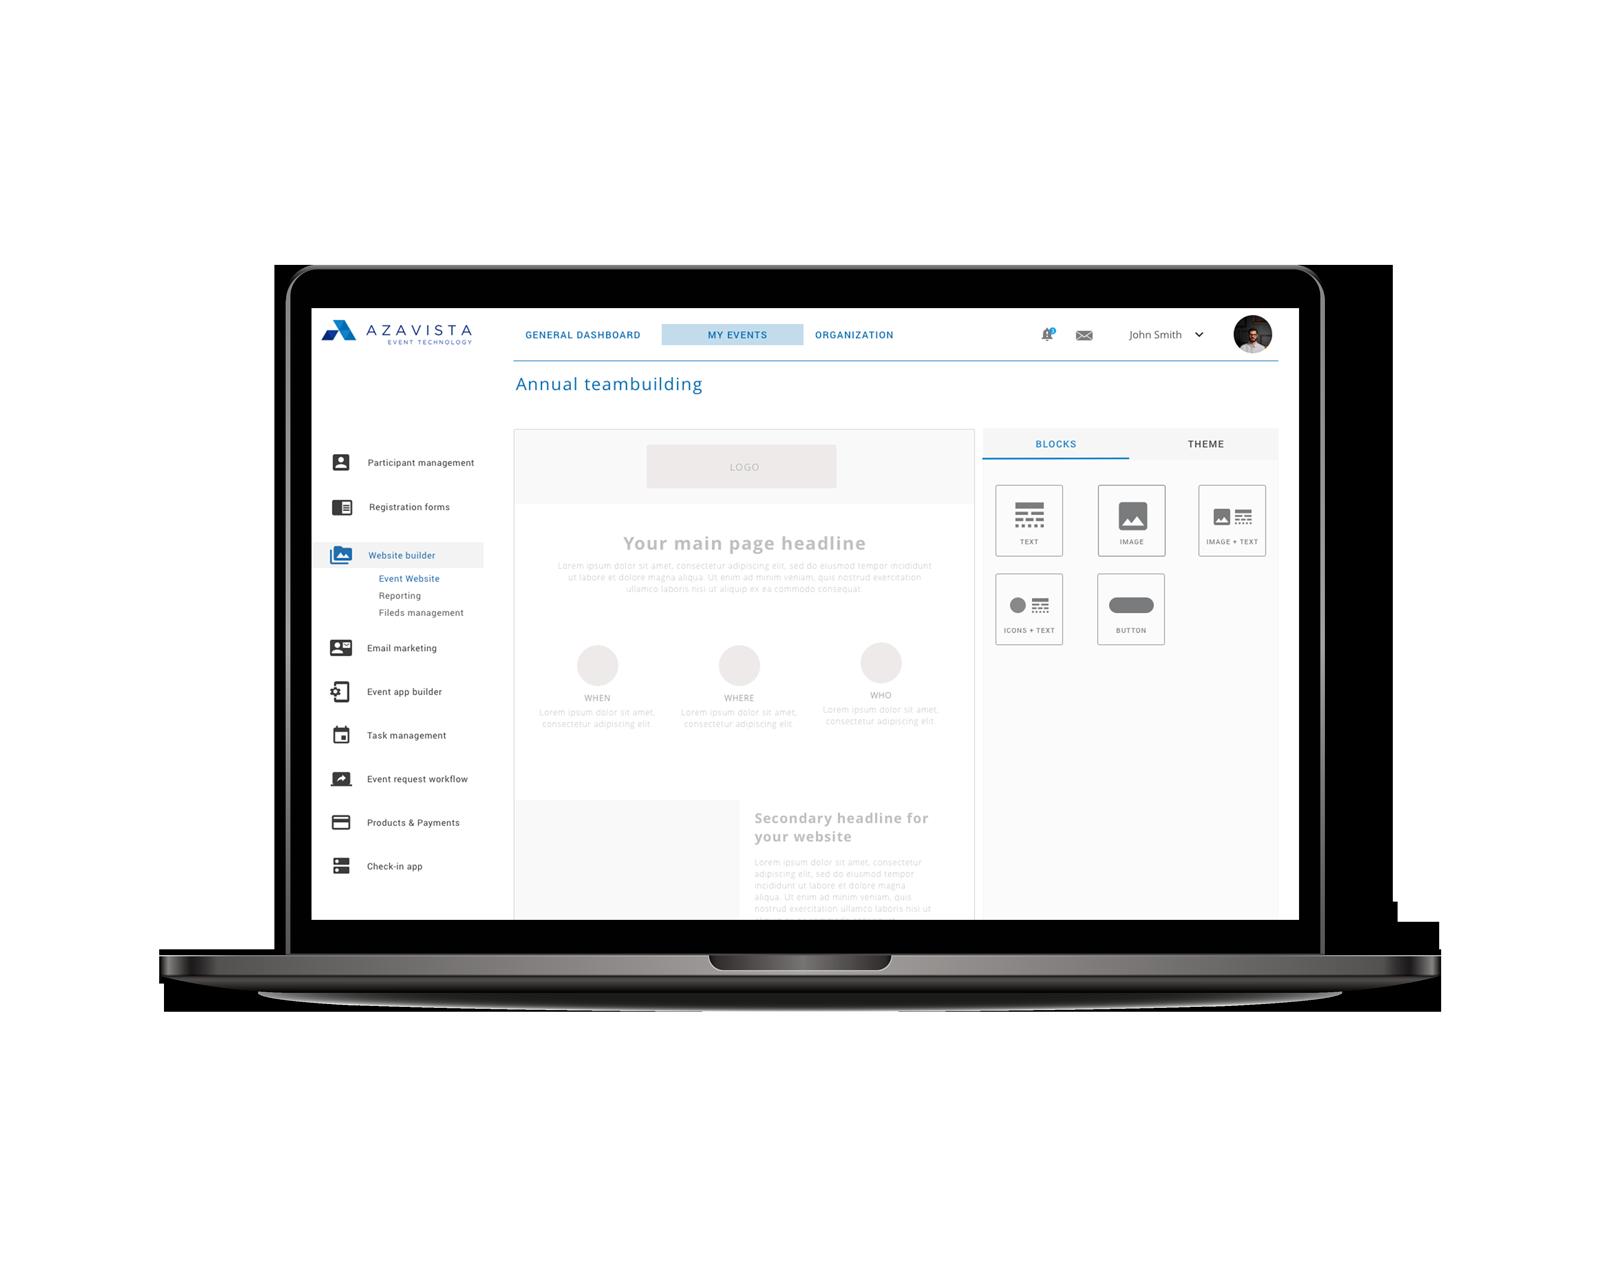 website-content-management-2